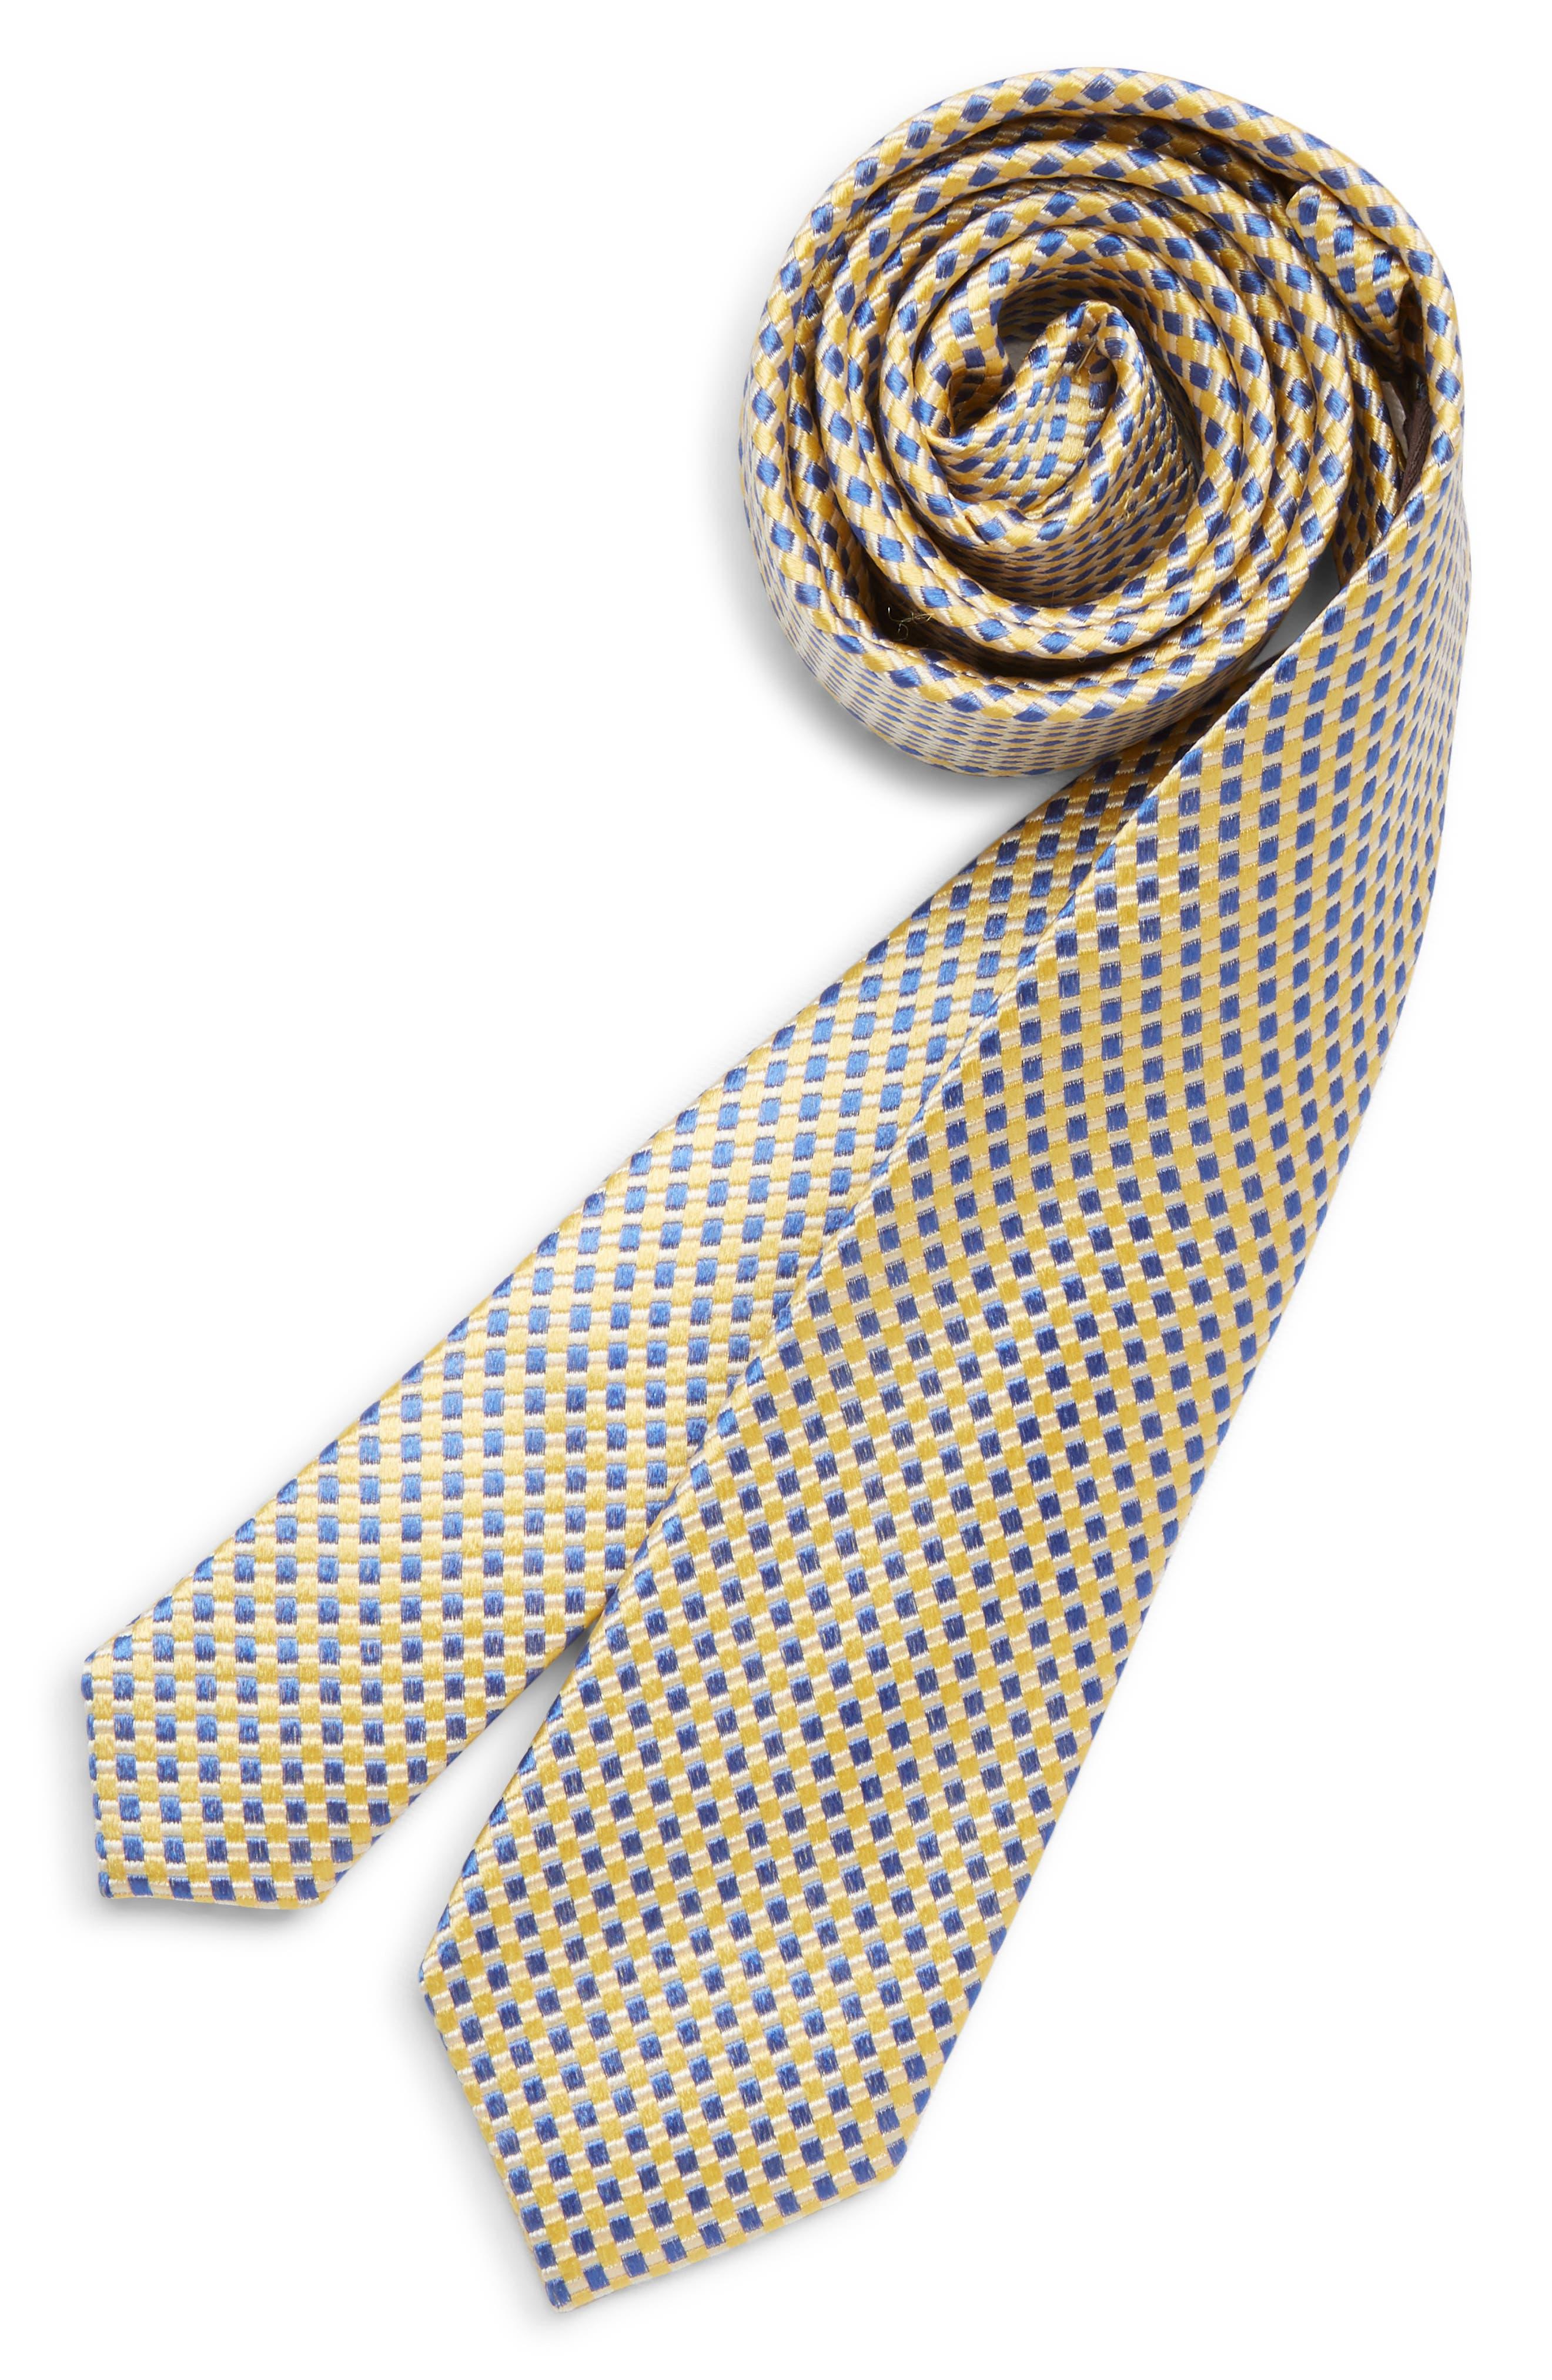 MICHAEL KORS,                             Check Silk Tie,                             Main thumbnail 1, color,                             YELLOW